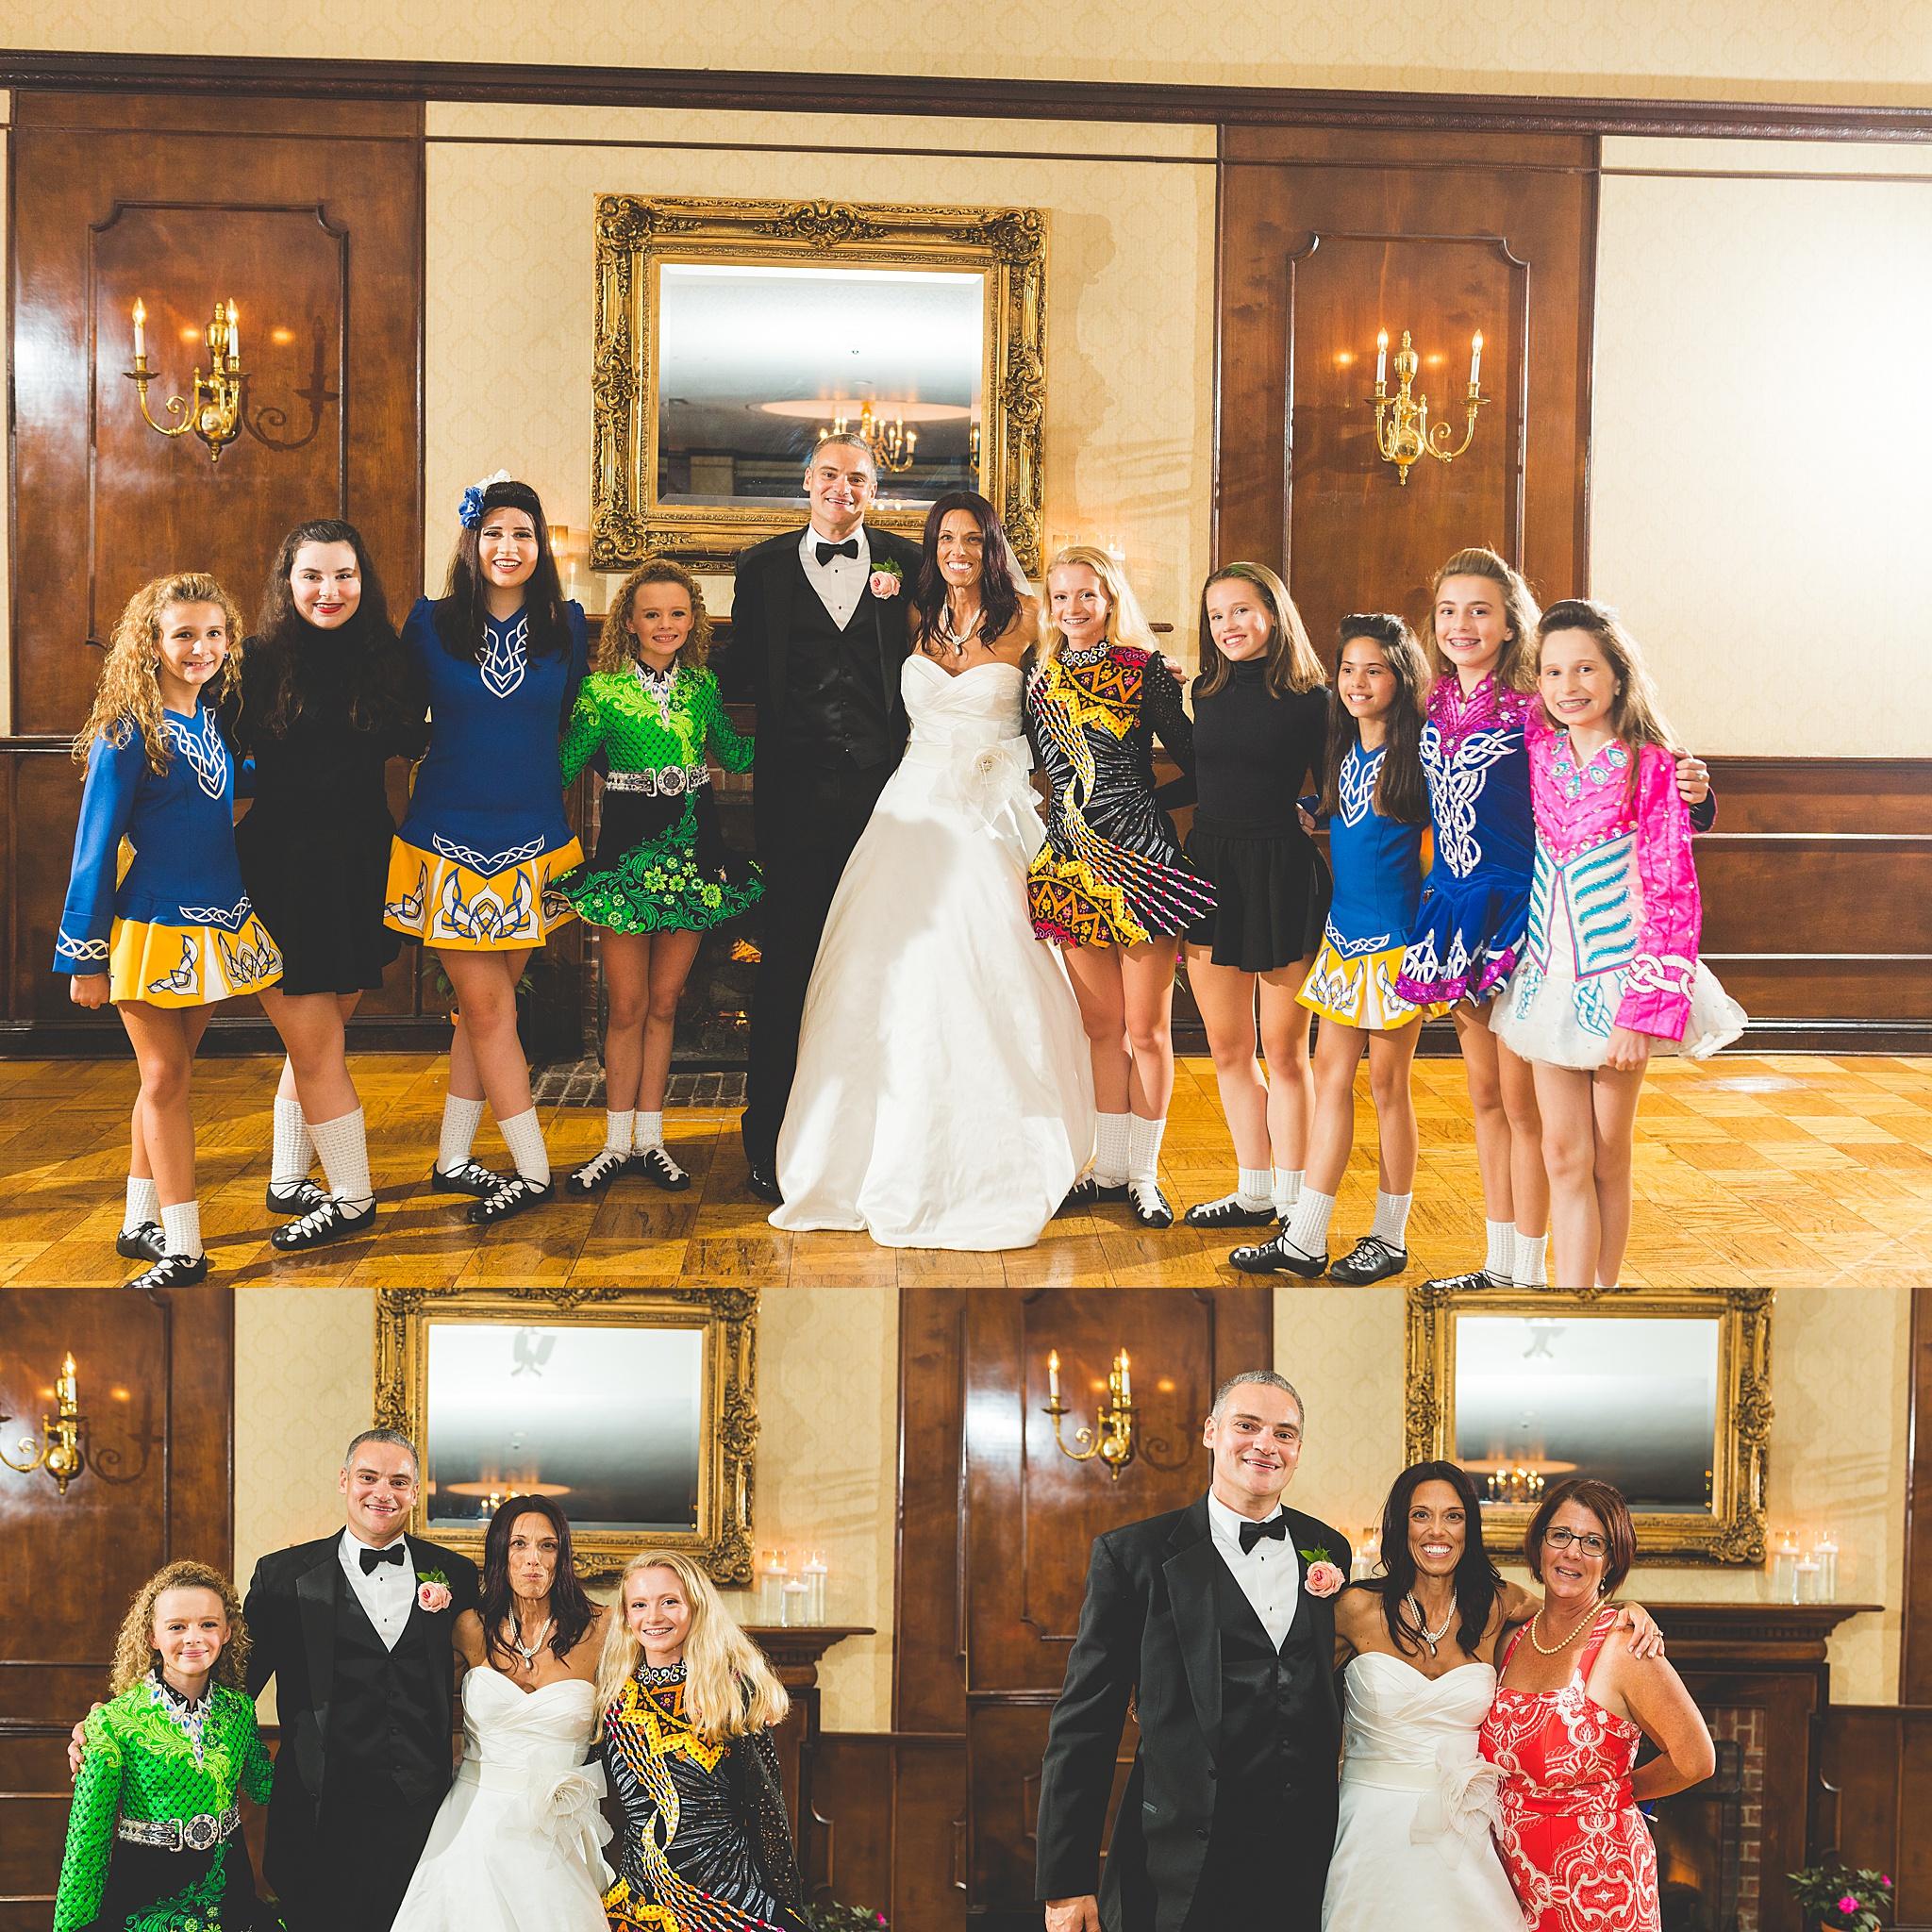 Albany_Wedding_Photographer_7649.jpg